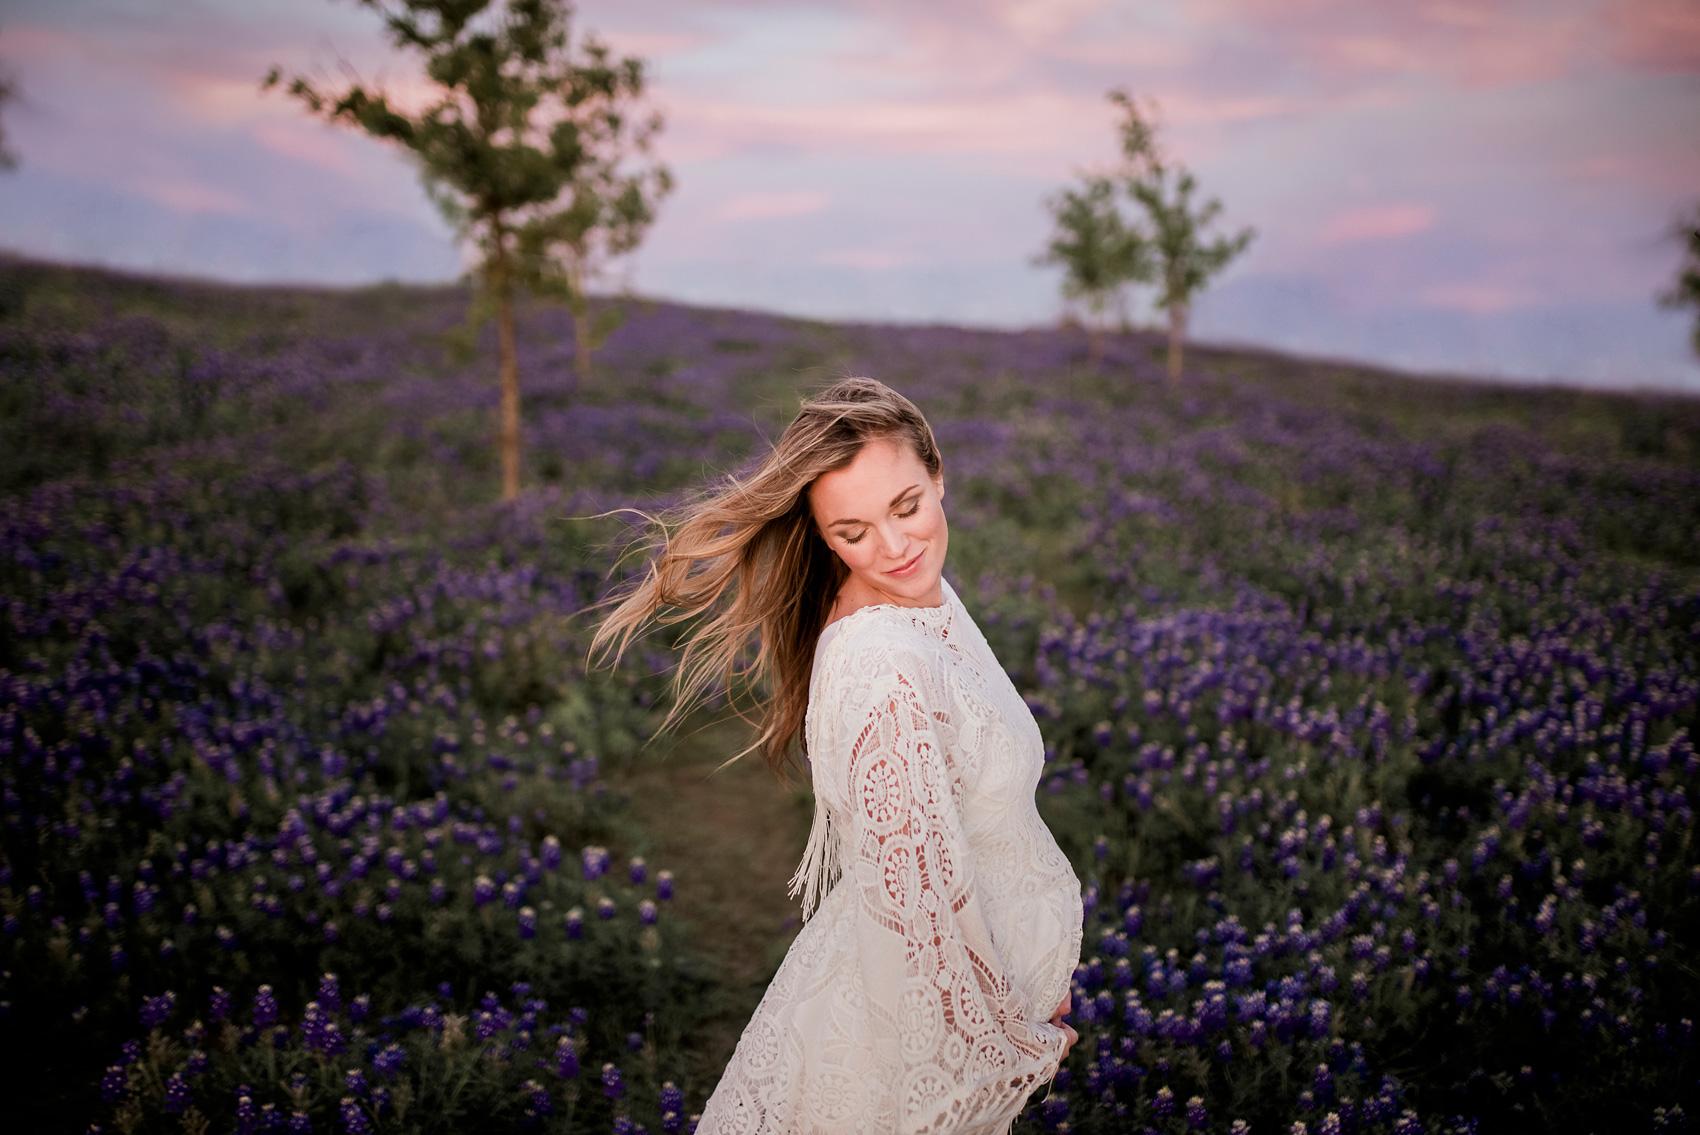 Pregnancy Photo Shoot Bluebonnets CLJ Photography Dallas Pregnancy Photo Shoot